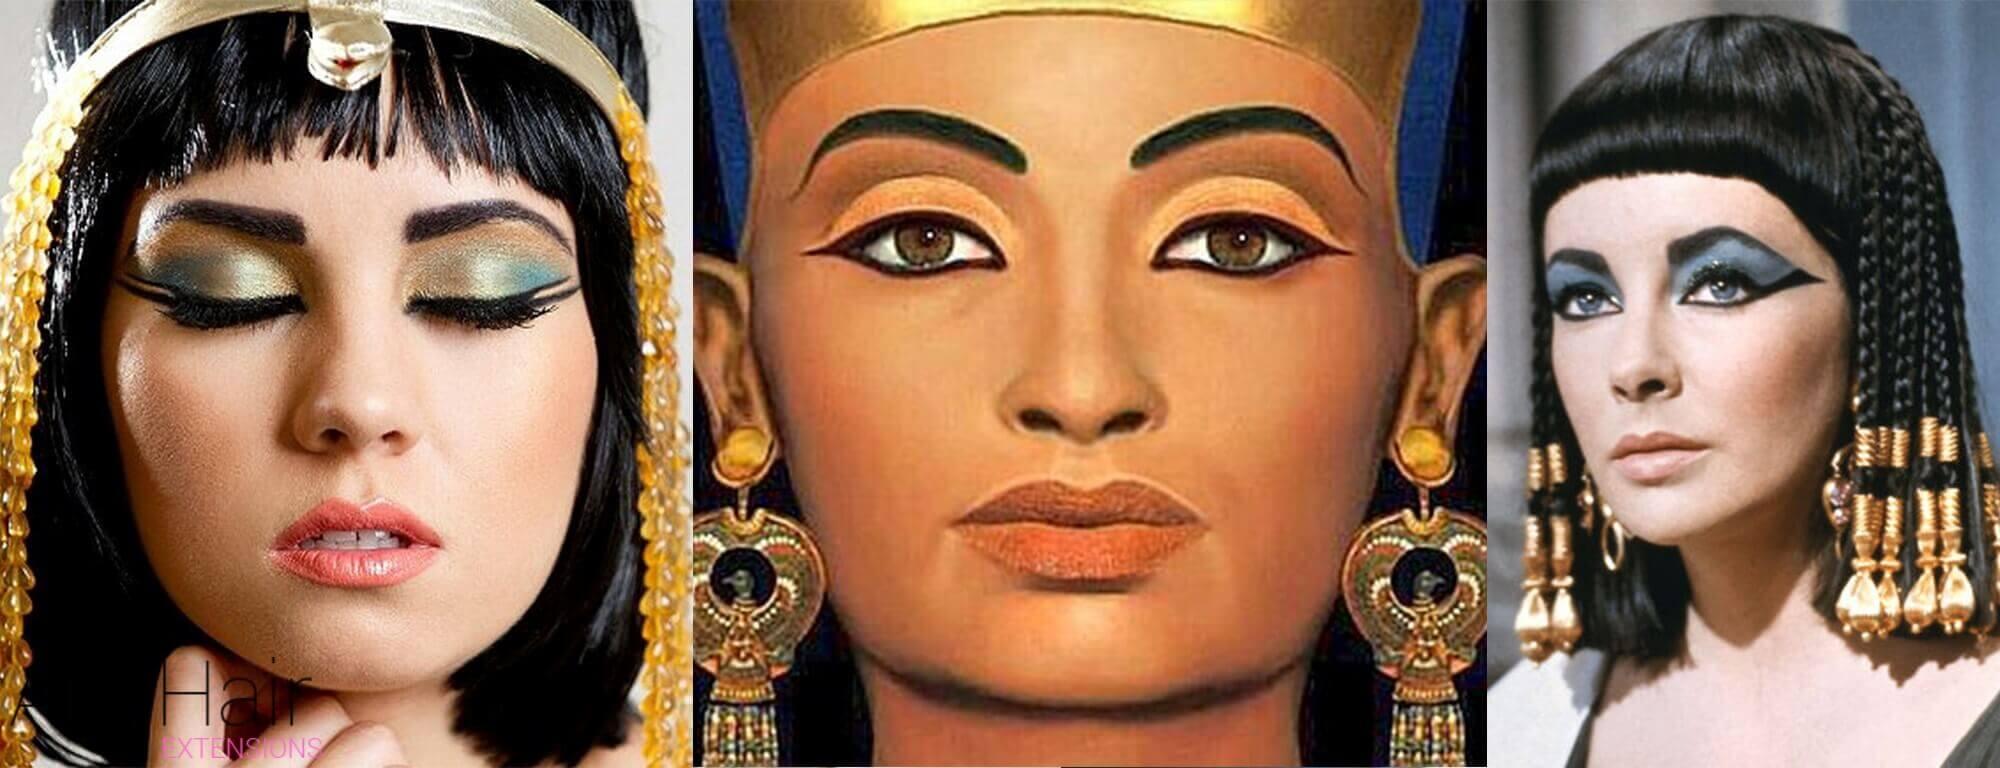 egyptian makeup women - photo #24